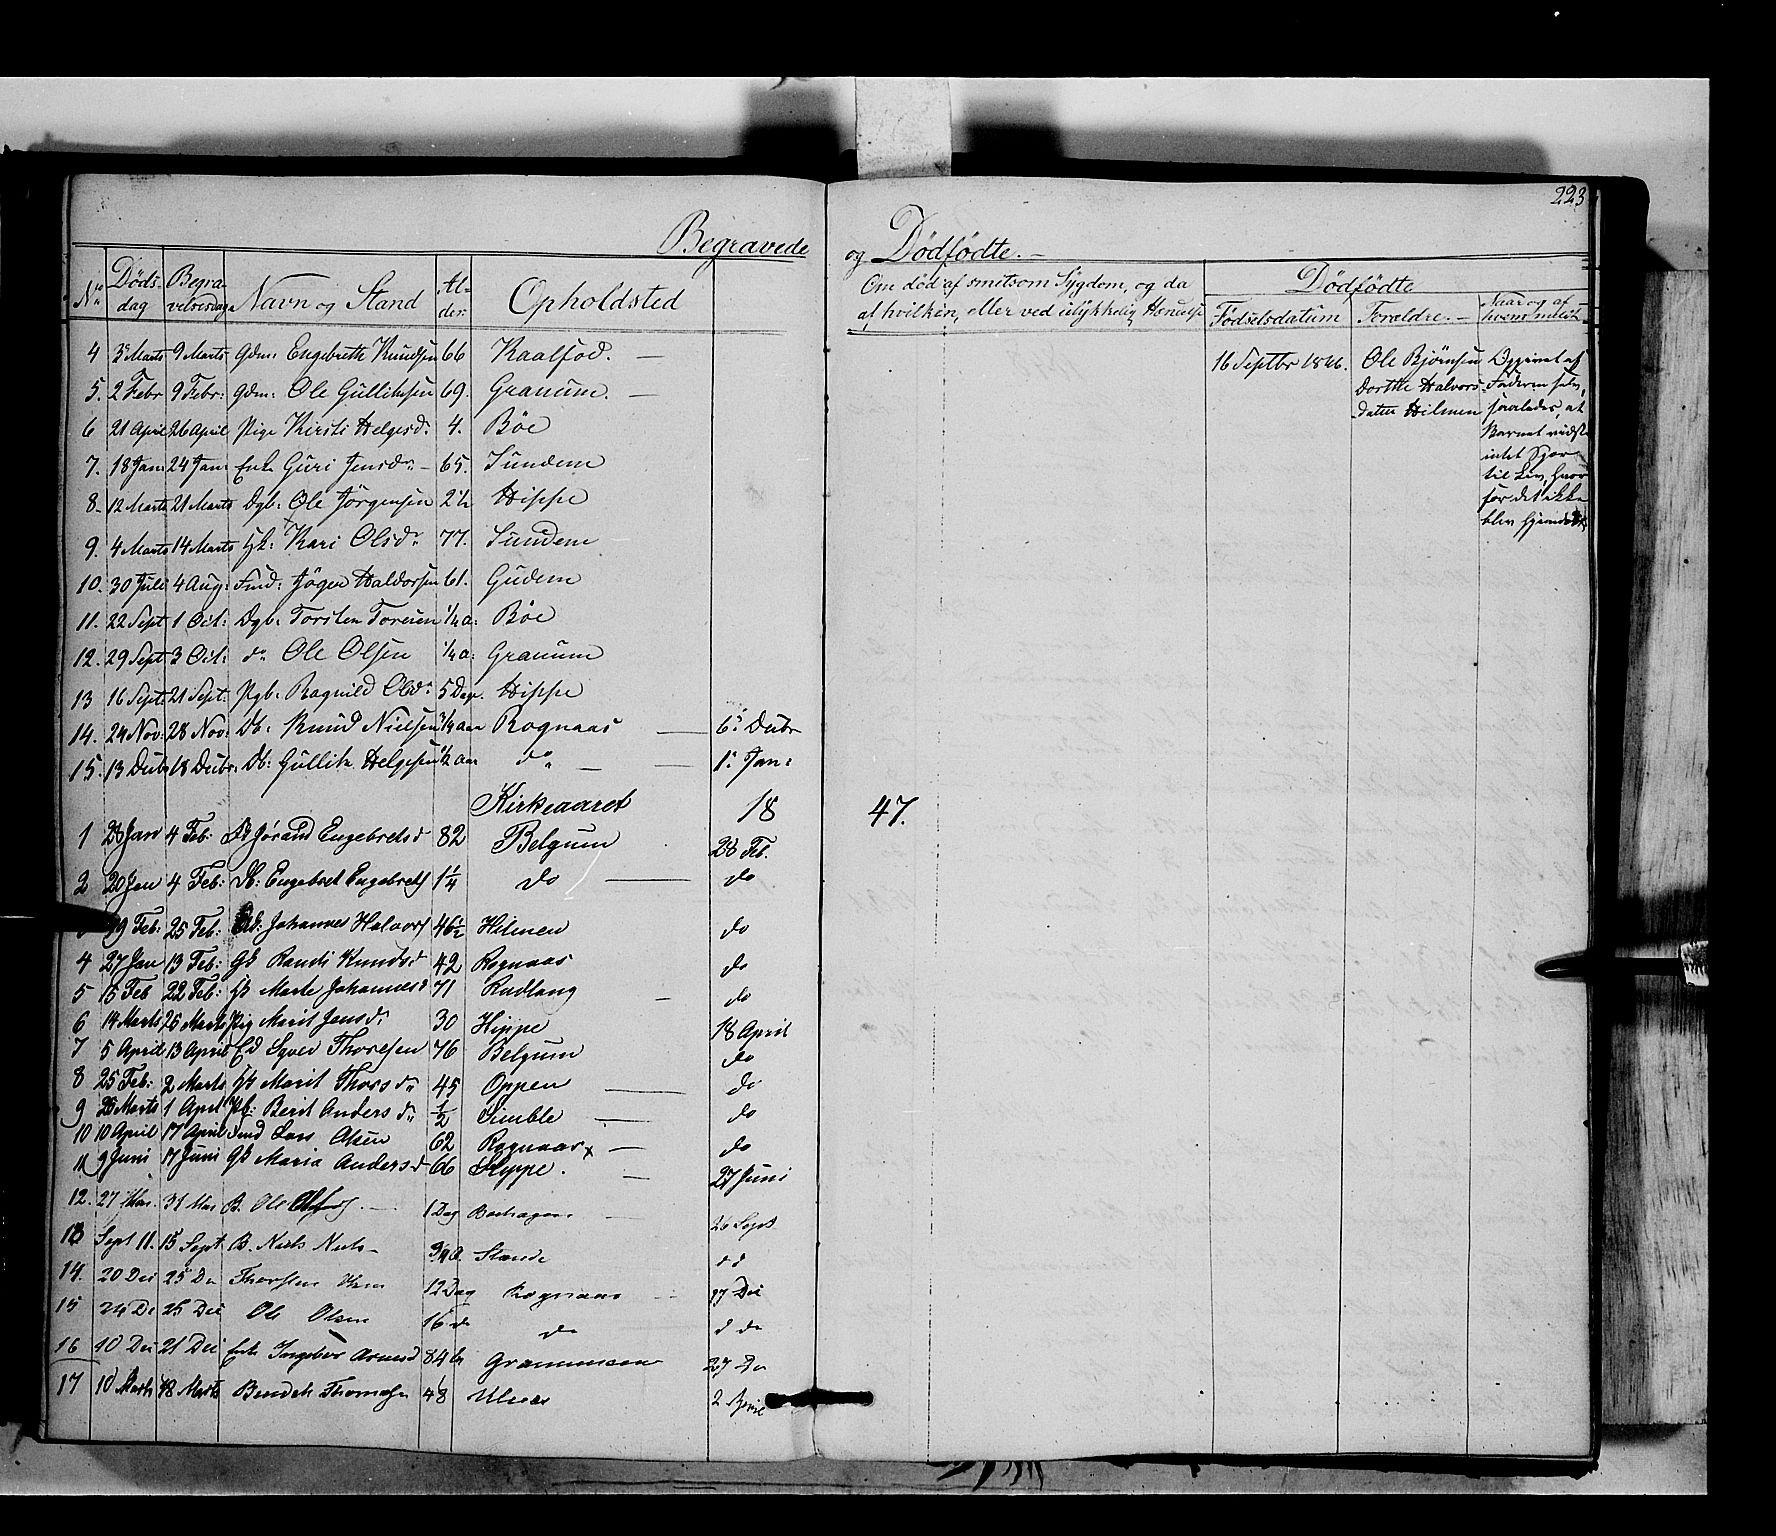 SAH, Nord-Aurdal prestekontor, Ministerialbok nr. 6, 1842-1863, s. 223